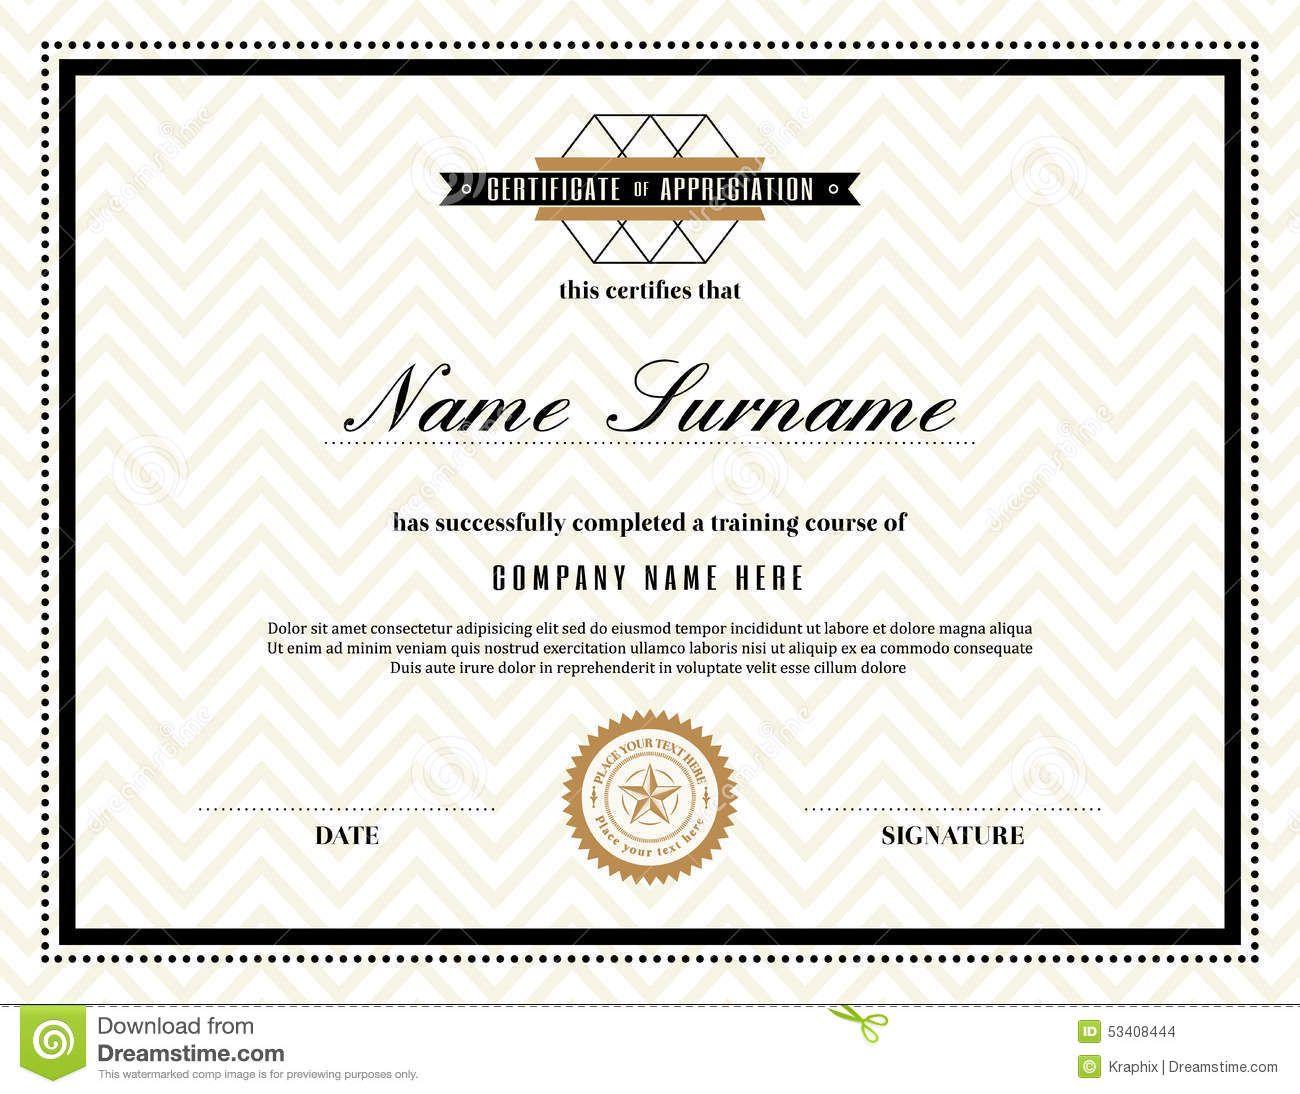 Share Certificate Template Certificate Templates Stock Certificates Free Certificate Templates